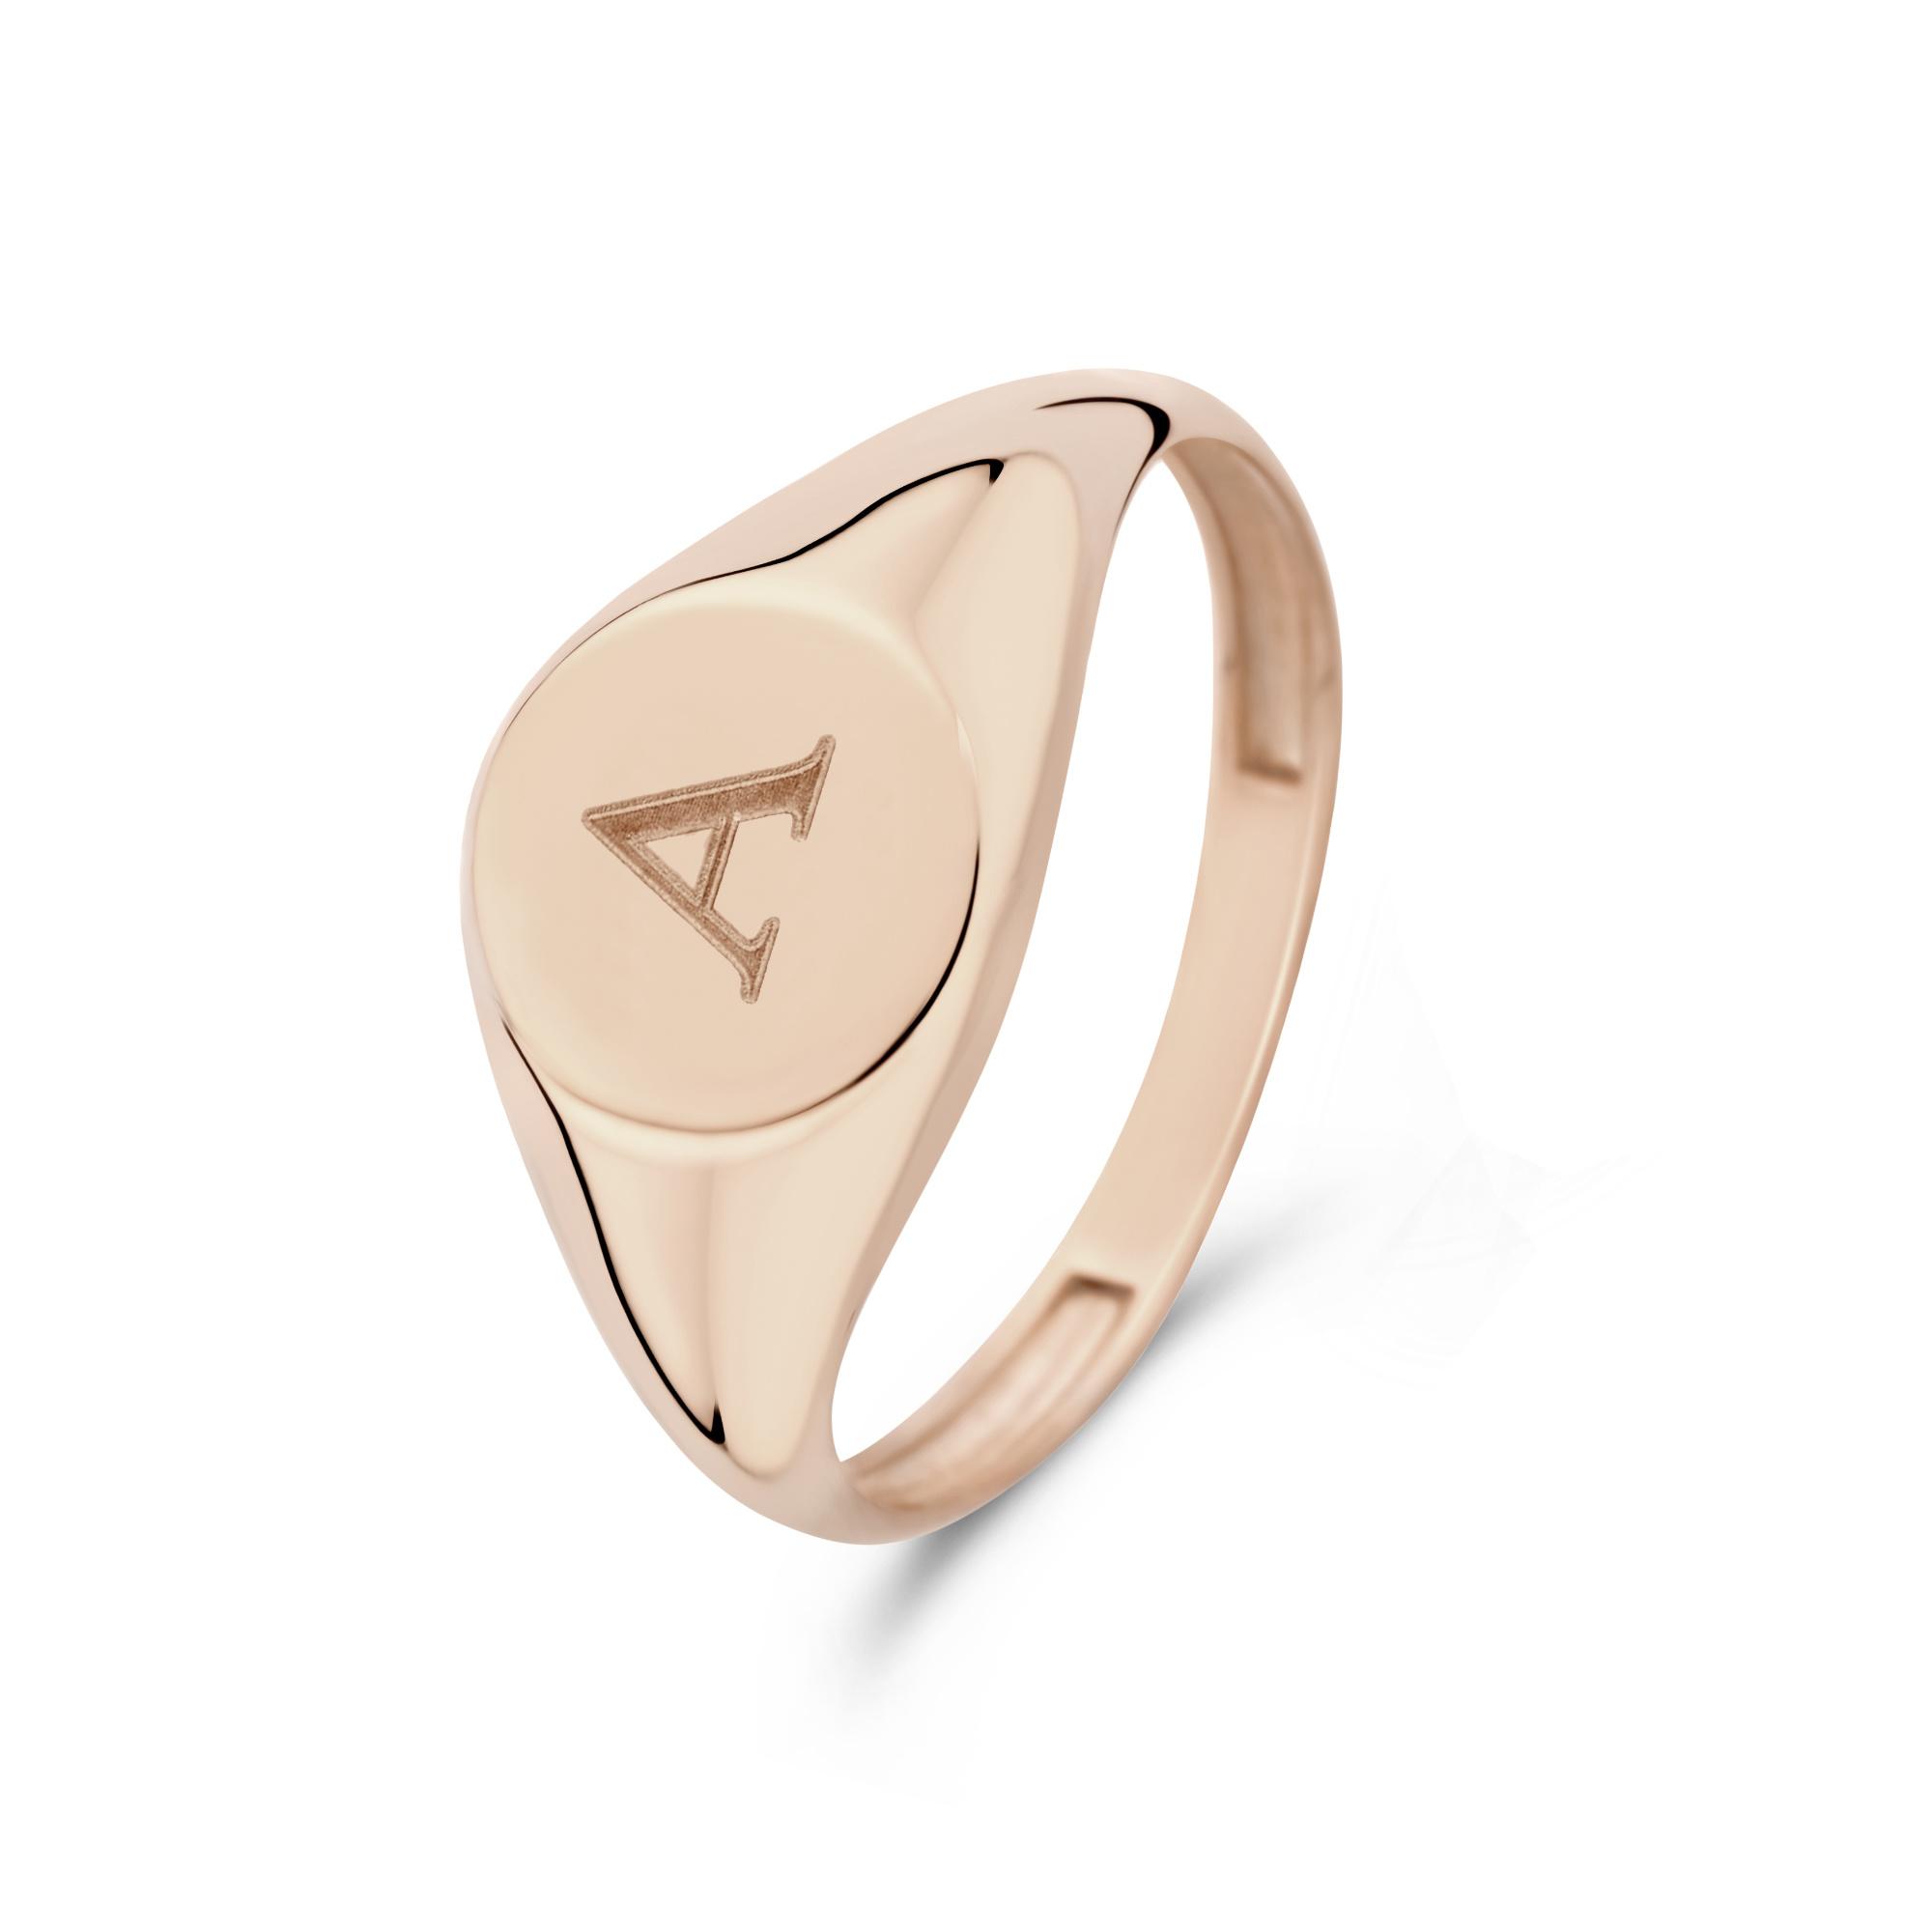 Isabel Bernard La Concorde Lauren 14 karat rose guld initial signet ring (48)